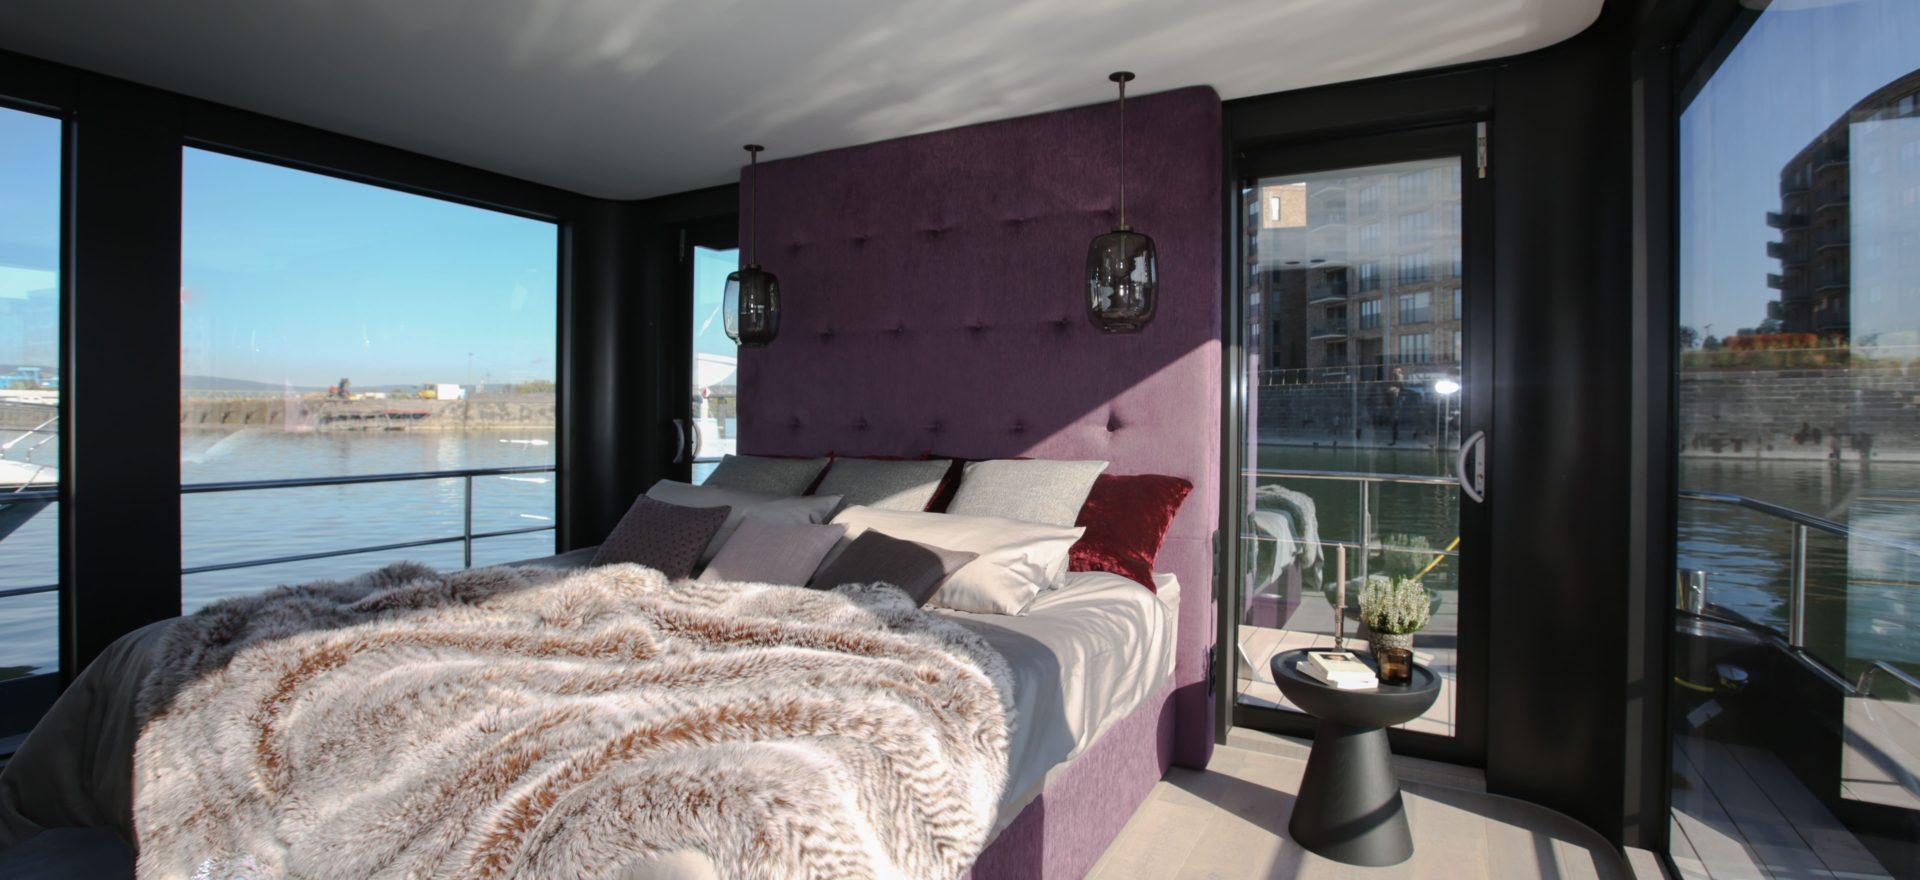 Schlafzimmer im Hausboot Traveller XL.jp